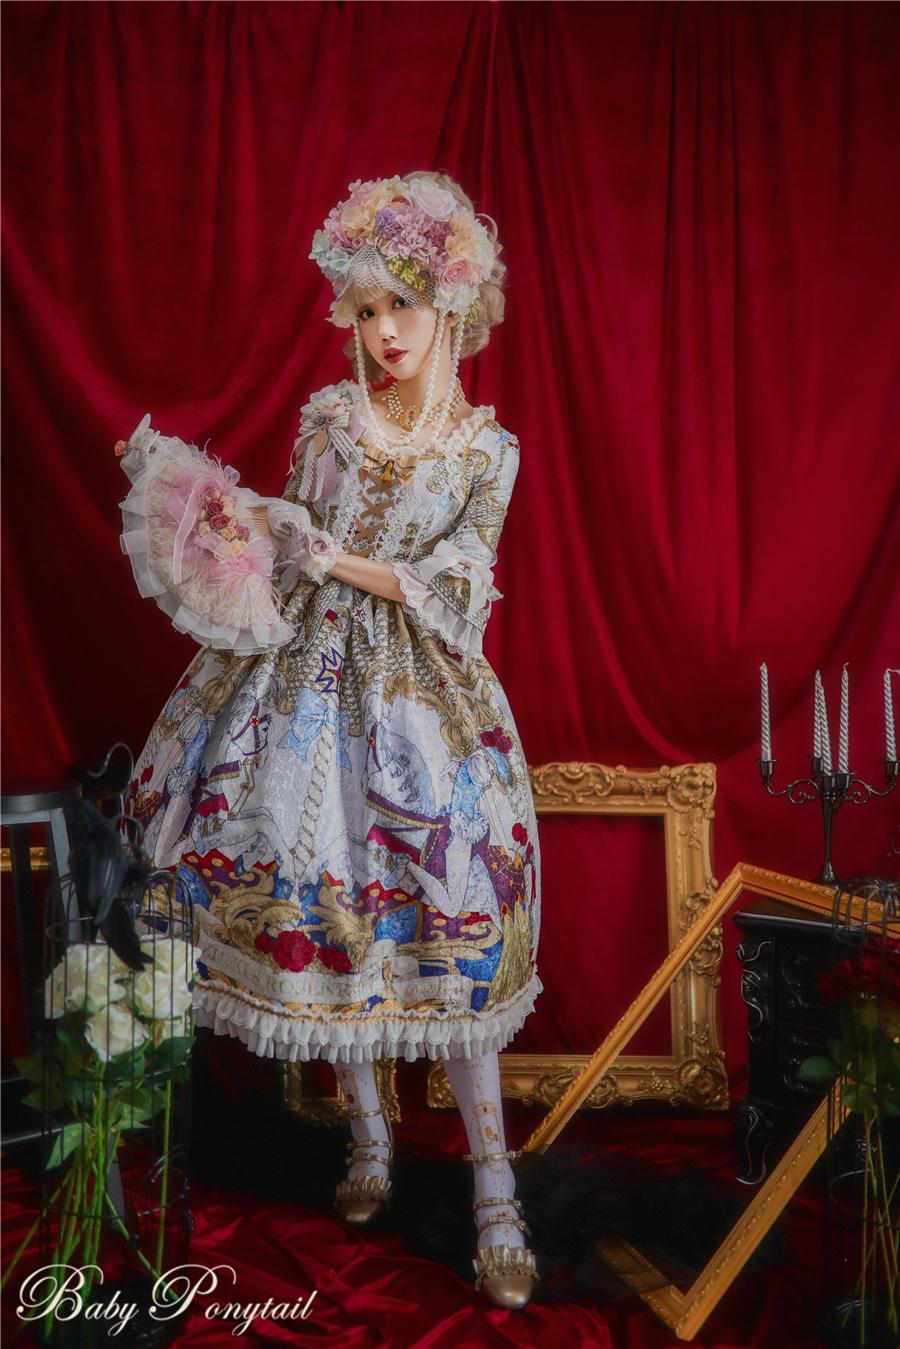 Baby Ponytail_Circus Princess_Silver OP_Kaka_08.jpg